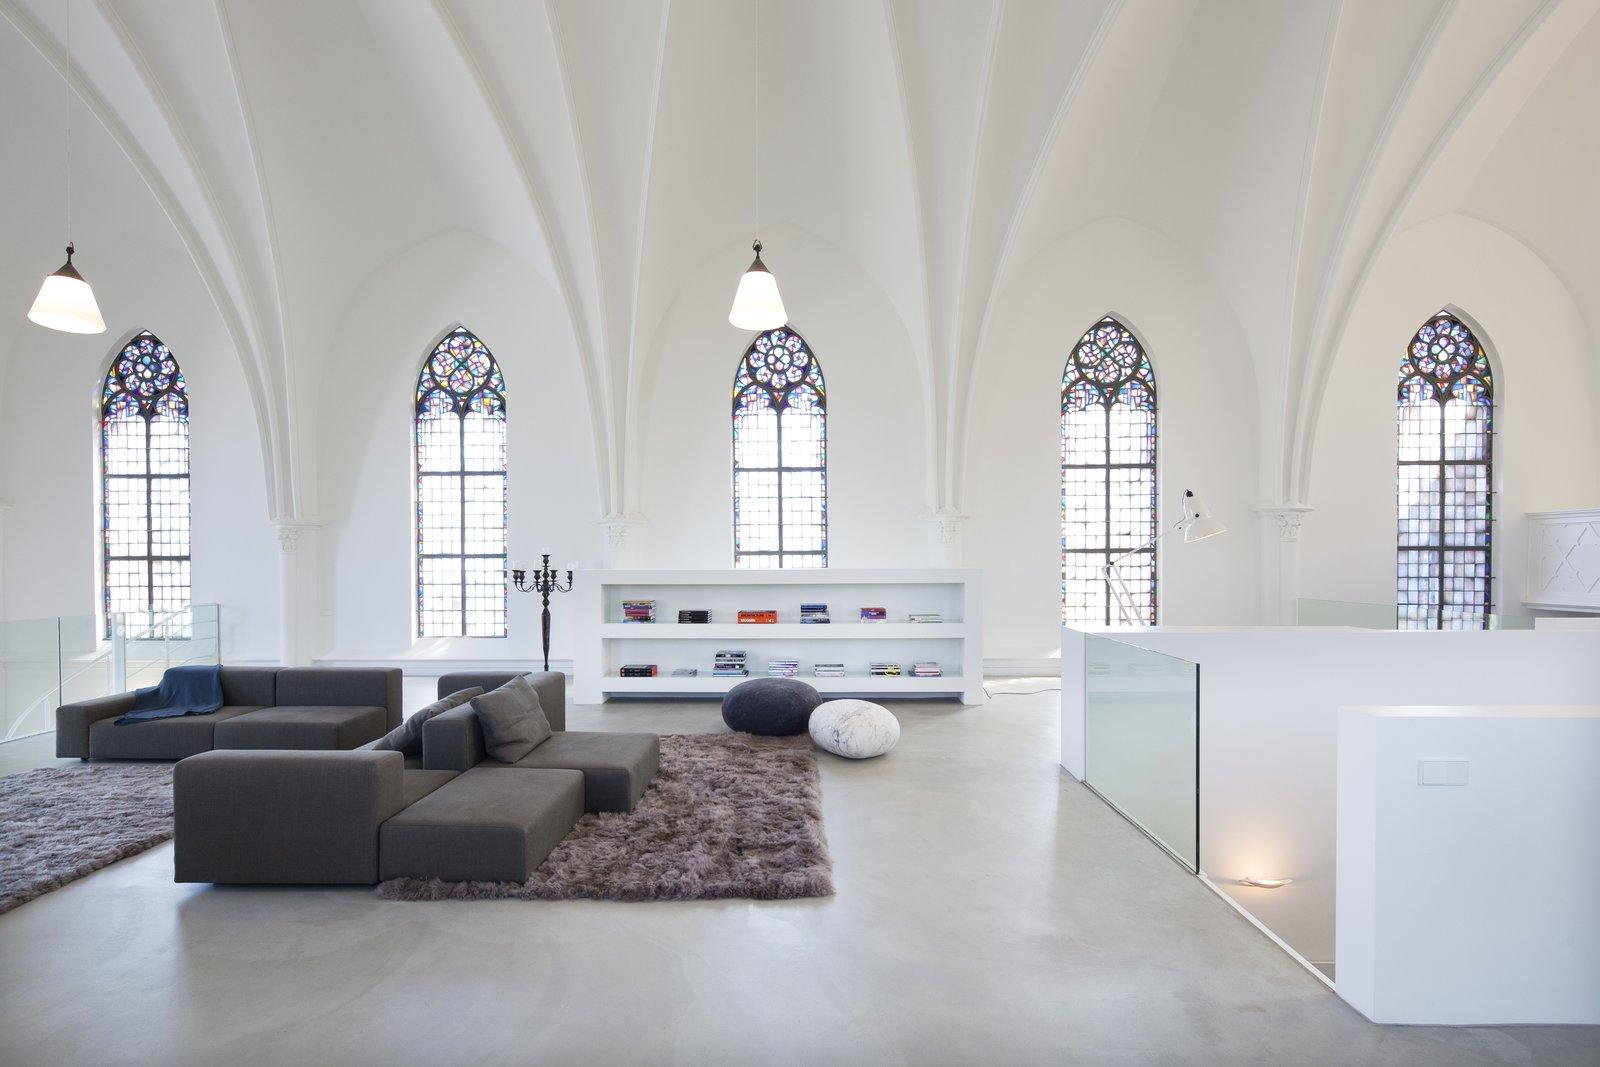 Woonkerk XL by Zecc Architects